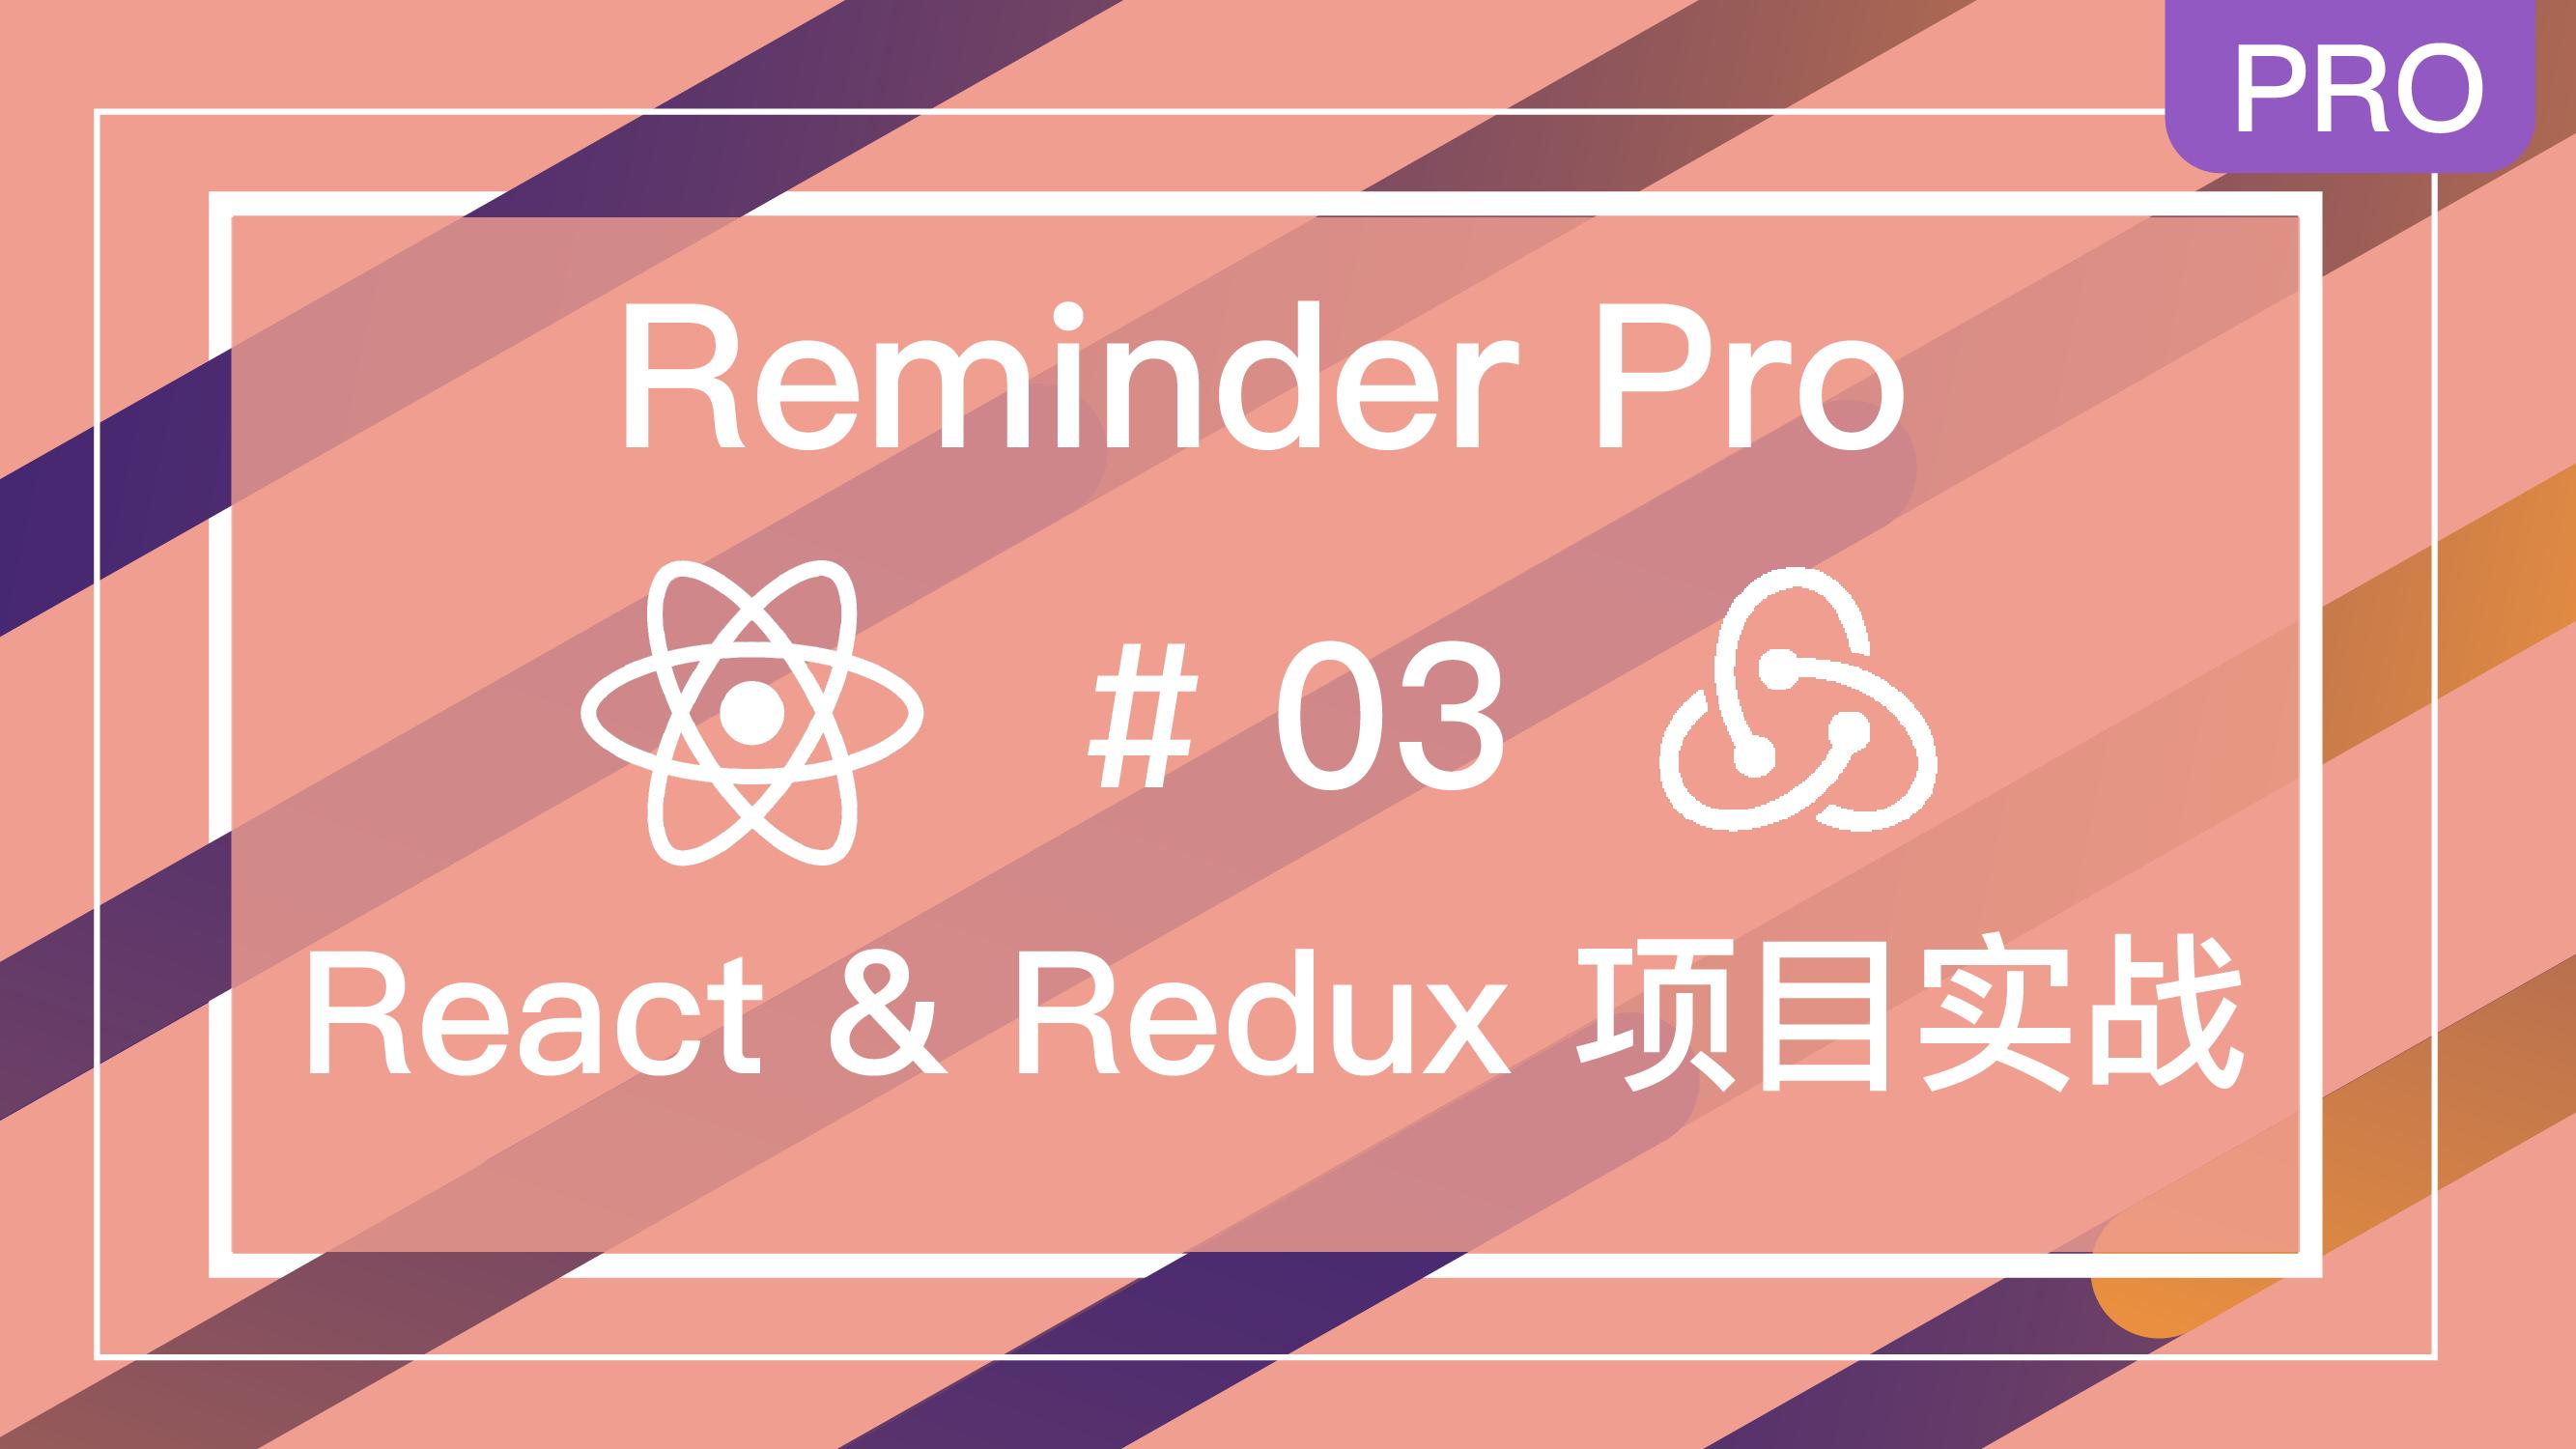 React & Redux 实战 Reminder Pro 项目 #3 处理时间